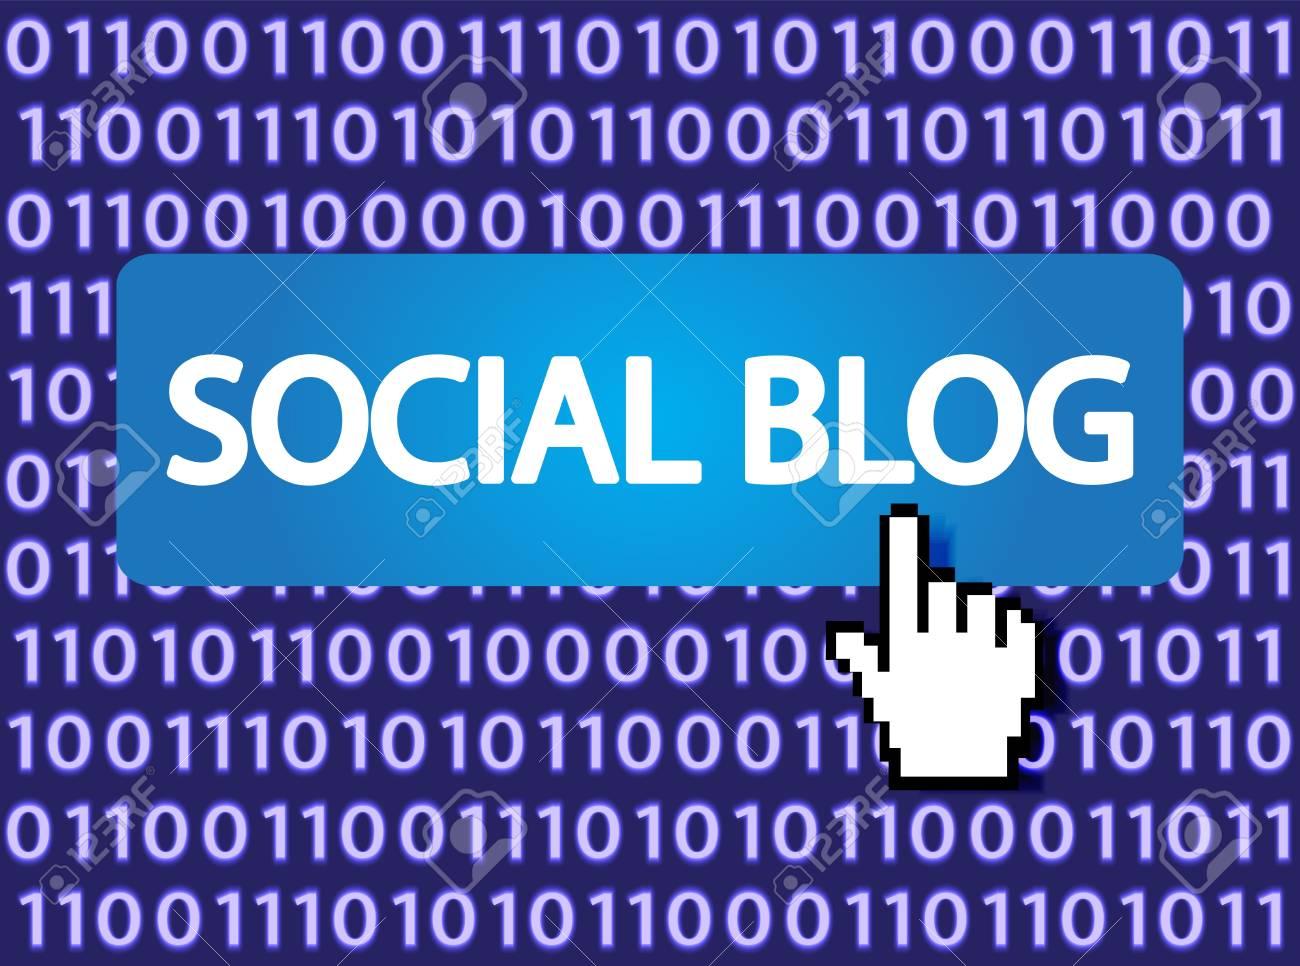 Social blog Button with Hand Cursor   Illustration Stock Vector - 12796354